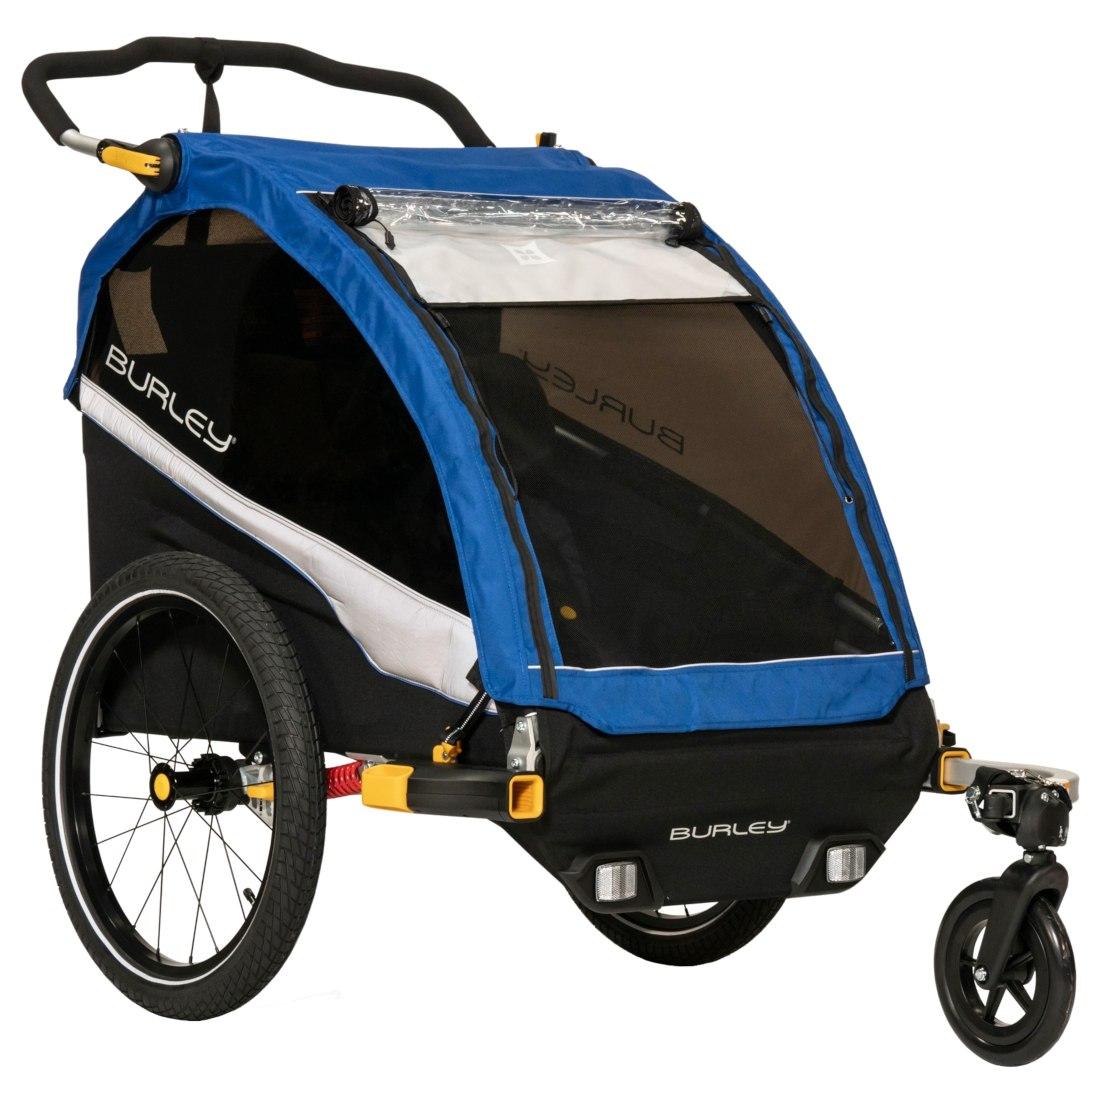 Burley D' Lite Bike Trailer for 1-2 Kids incl. Cover - old school blue